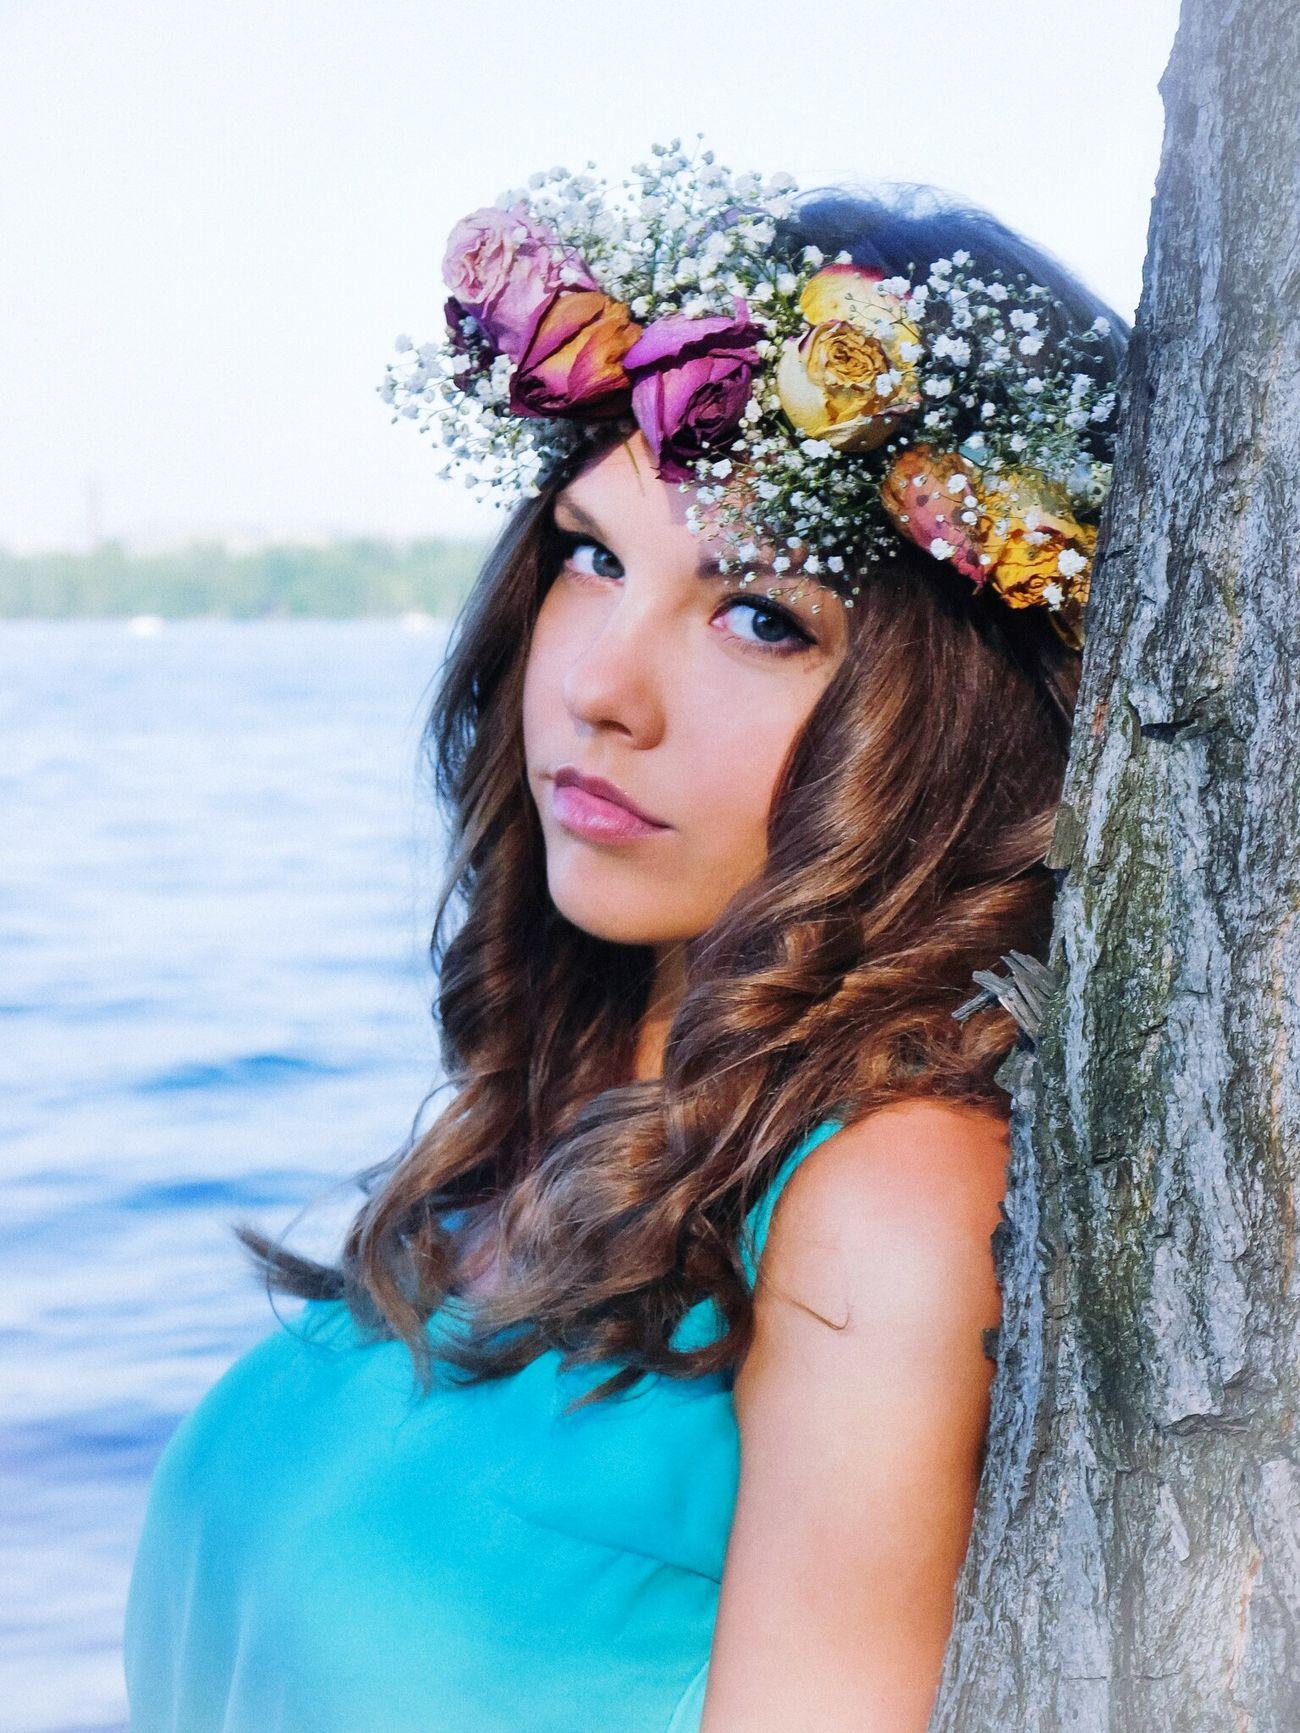 красноярск девушка Природа Енисей Россия Krasnoyarsk Russia Russian Girl Girl Summer Beauty